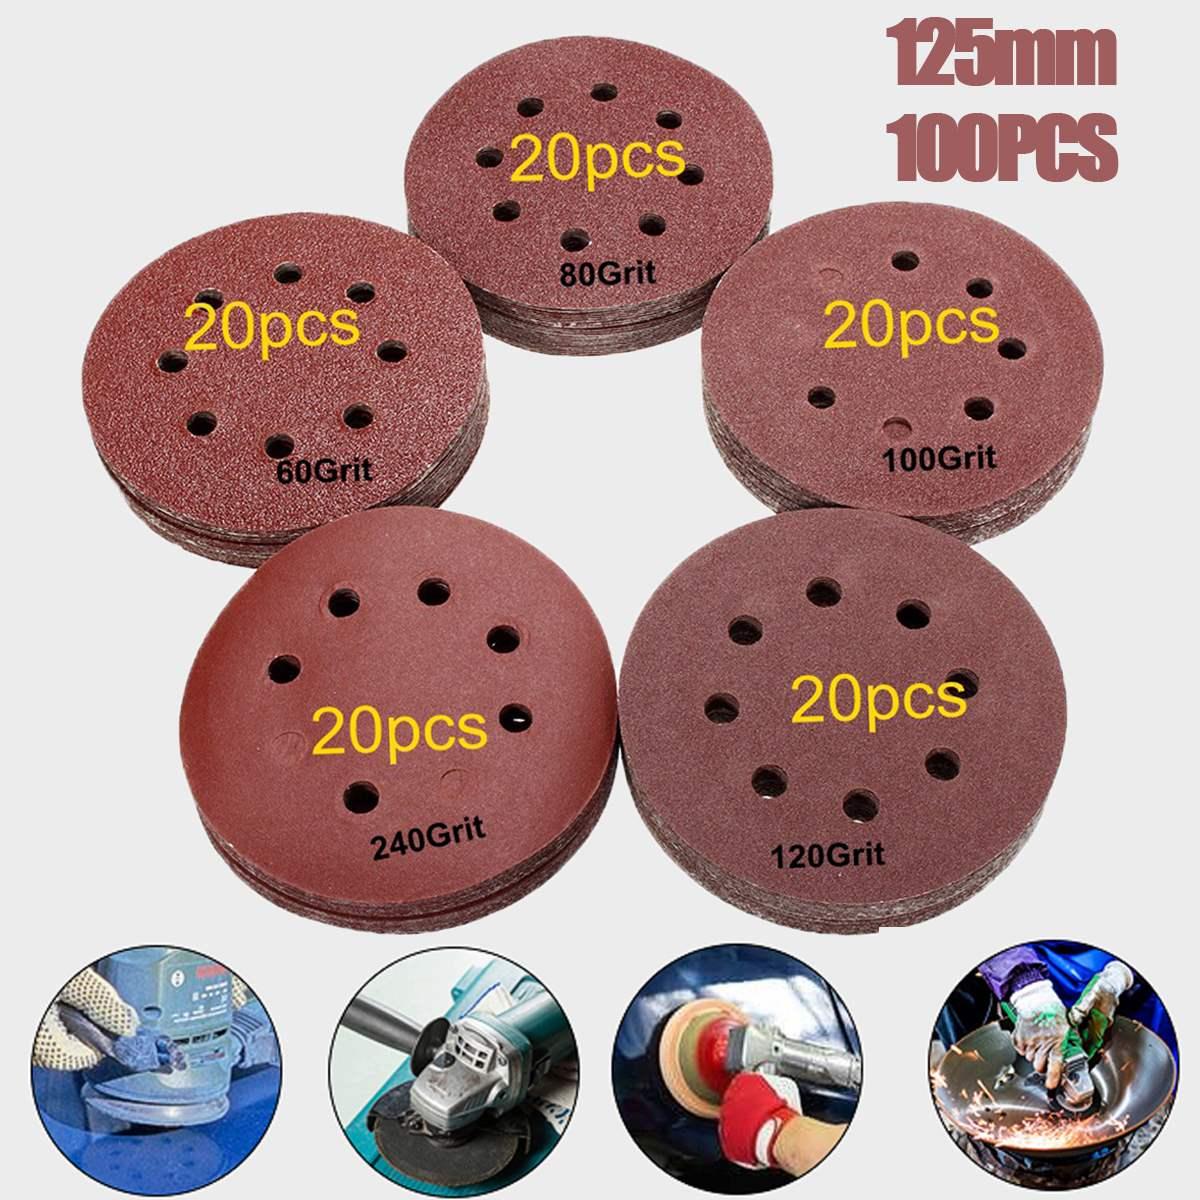 100pcs 125mm 60 80 100 120 240 Grit Round Shape Sanding Discs Buffing Sheet Sandpaper 8 Hole Sander Polishing Pad Each Of 20